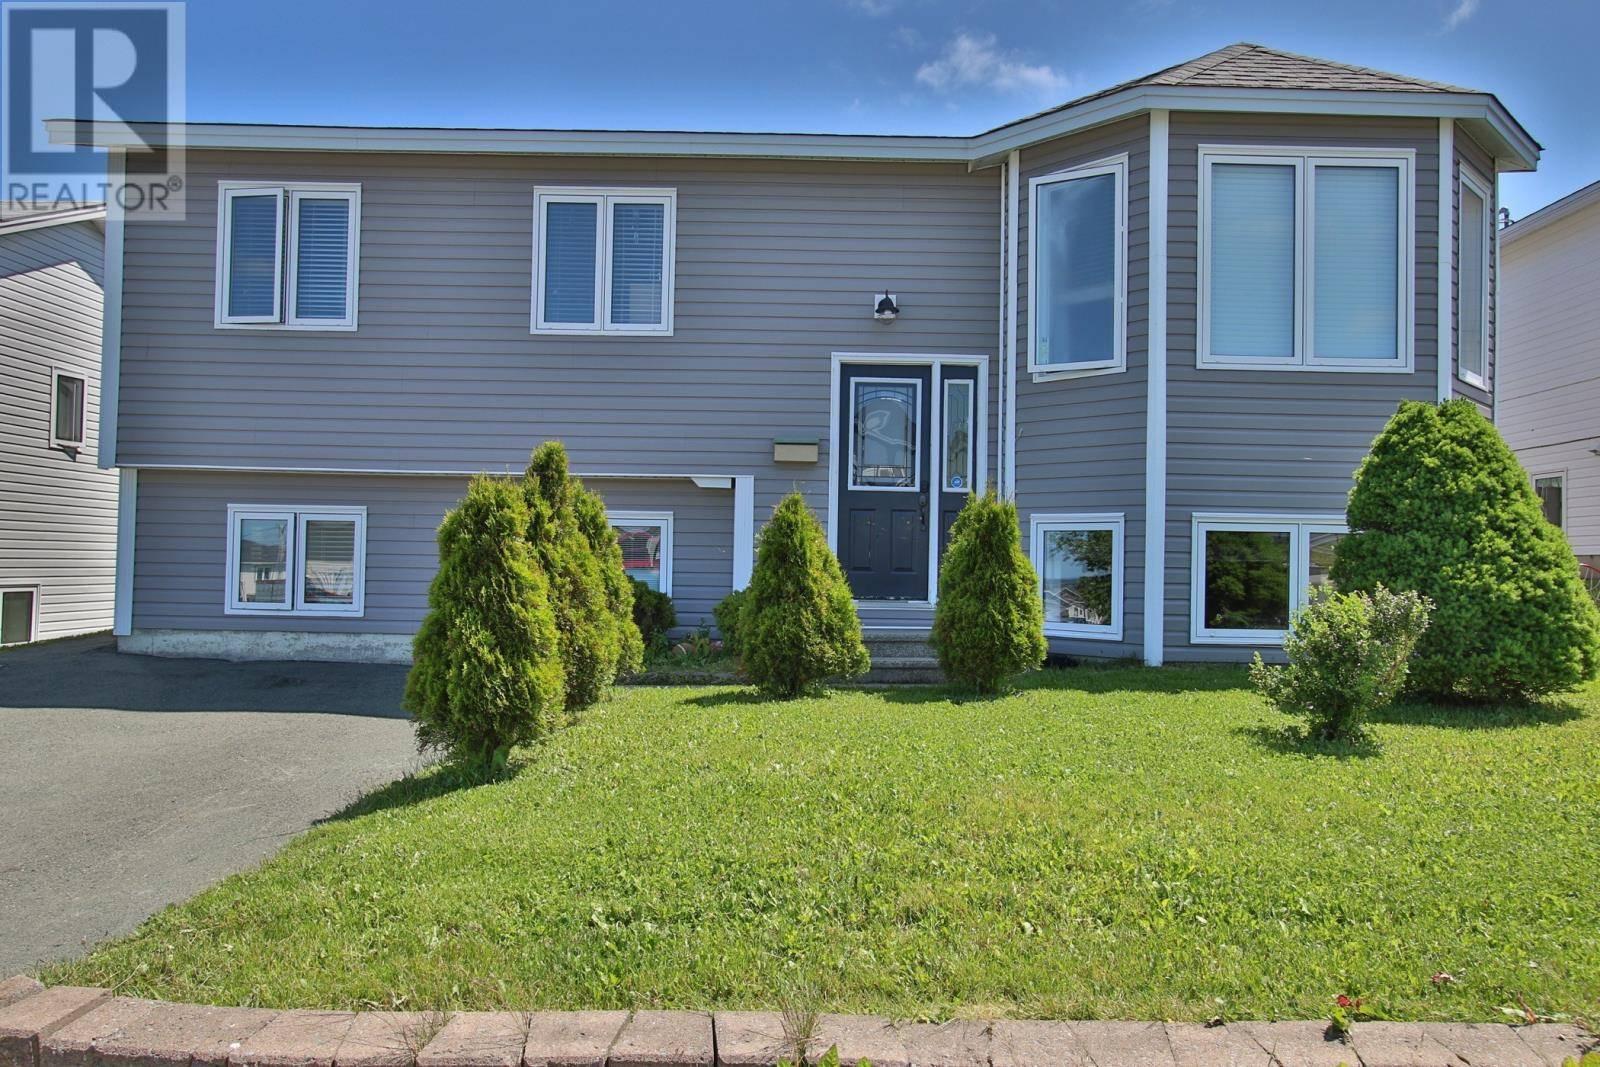 House for sale at 59 Halls Rd St. John's Newfoundland - MLS: 1209525